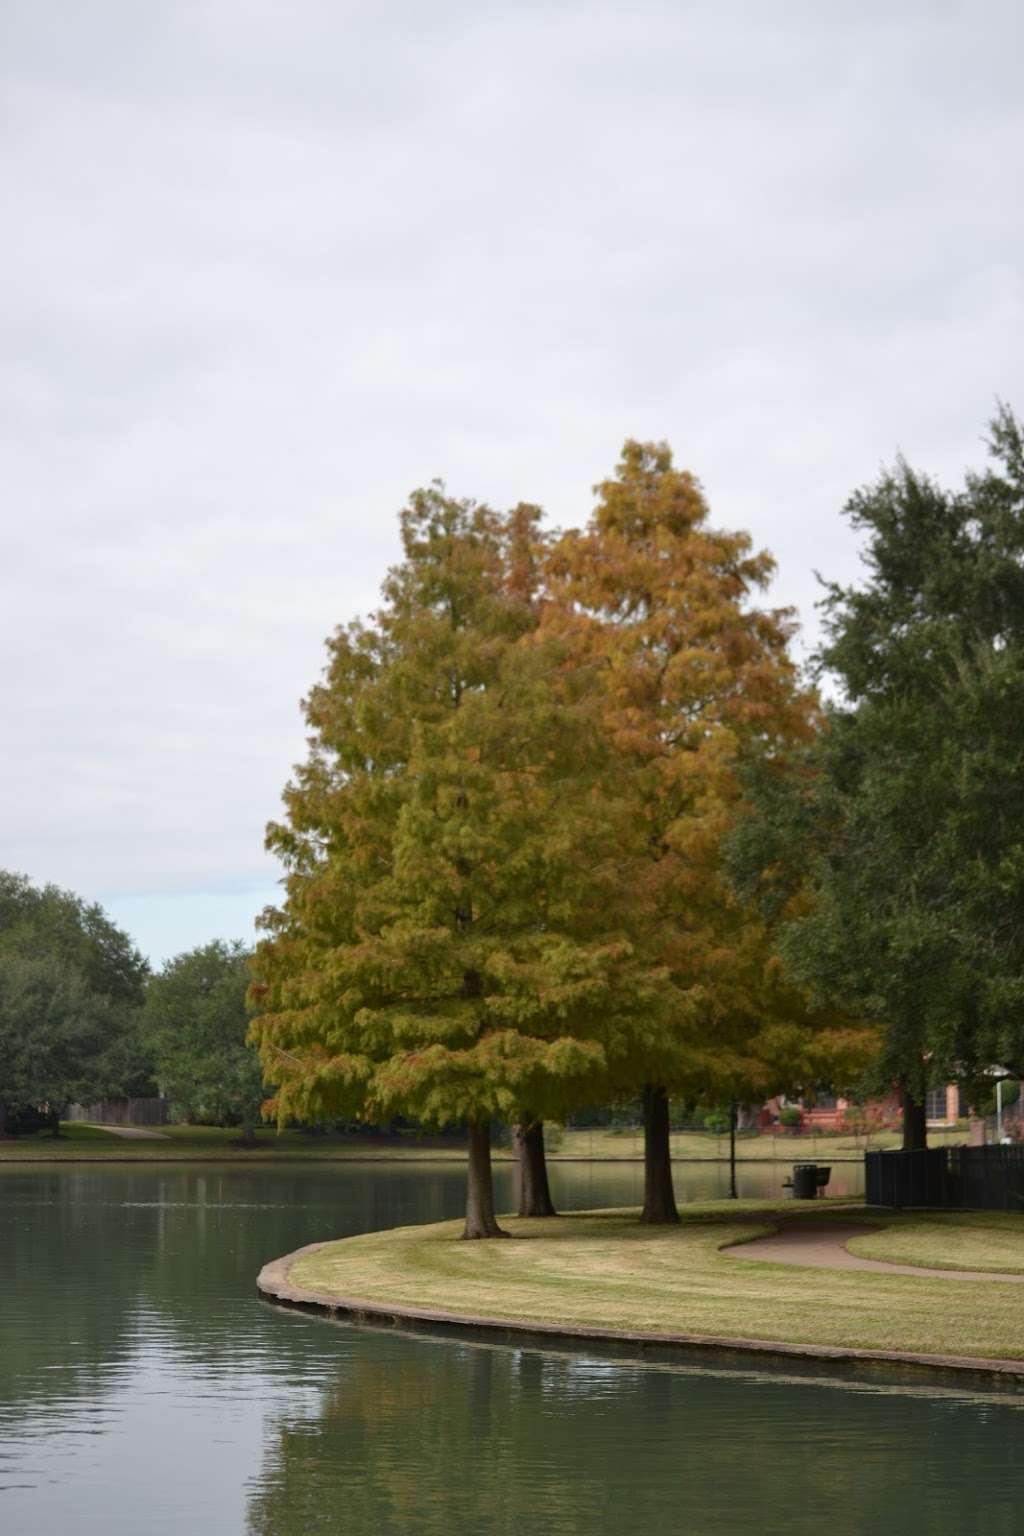 Pecan Park - park  | Photo 6 of 9 | Address: Pecan Orchard Blvd, Sugar Land, TX 77479, USA | Phone: (281) 565-0616